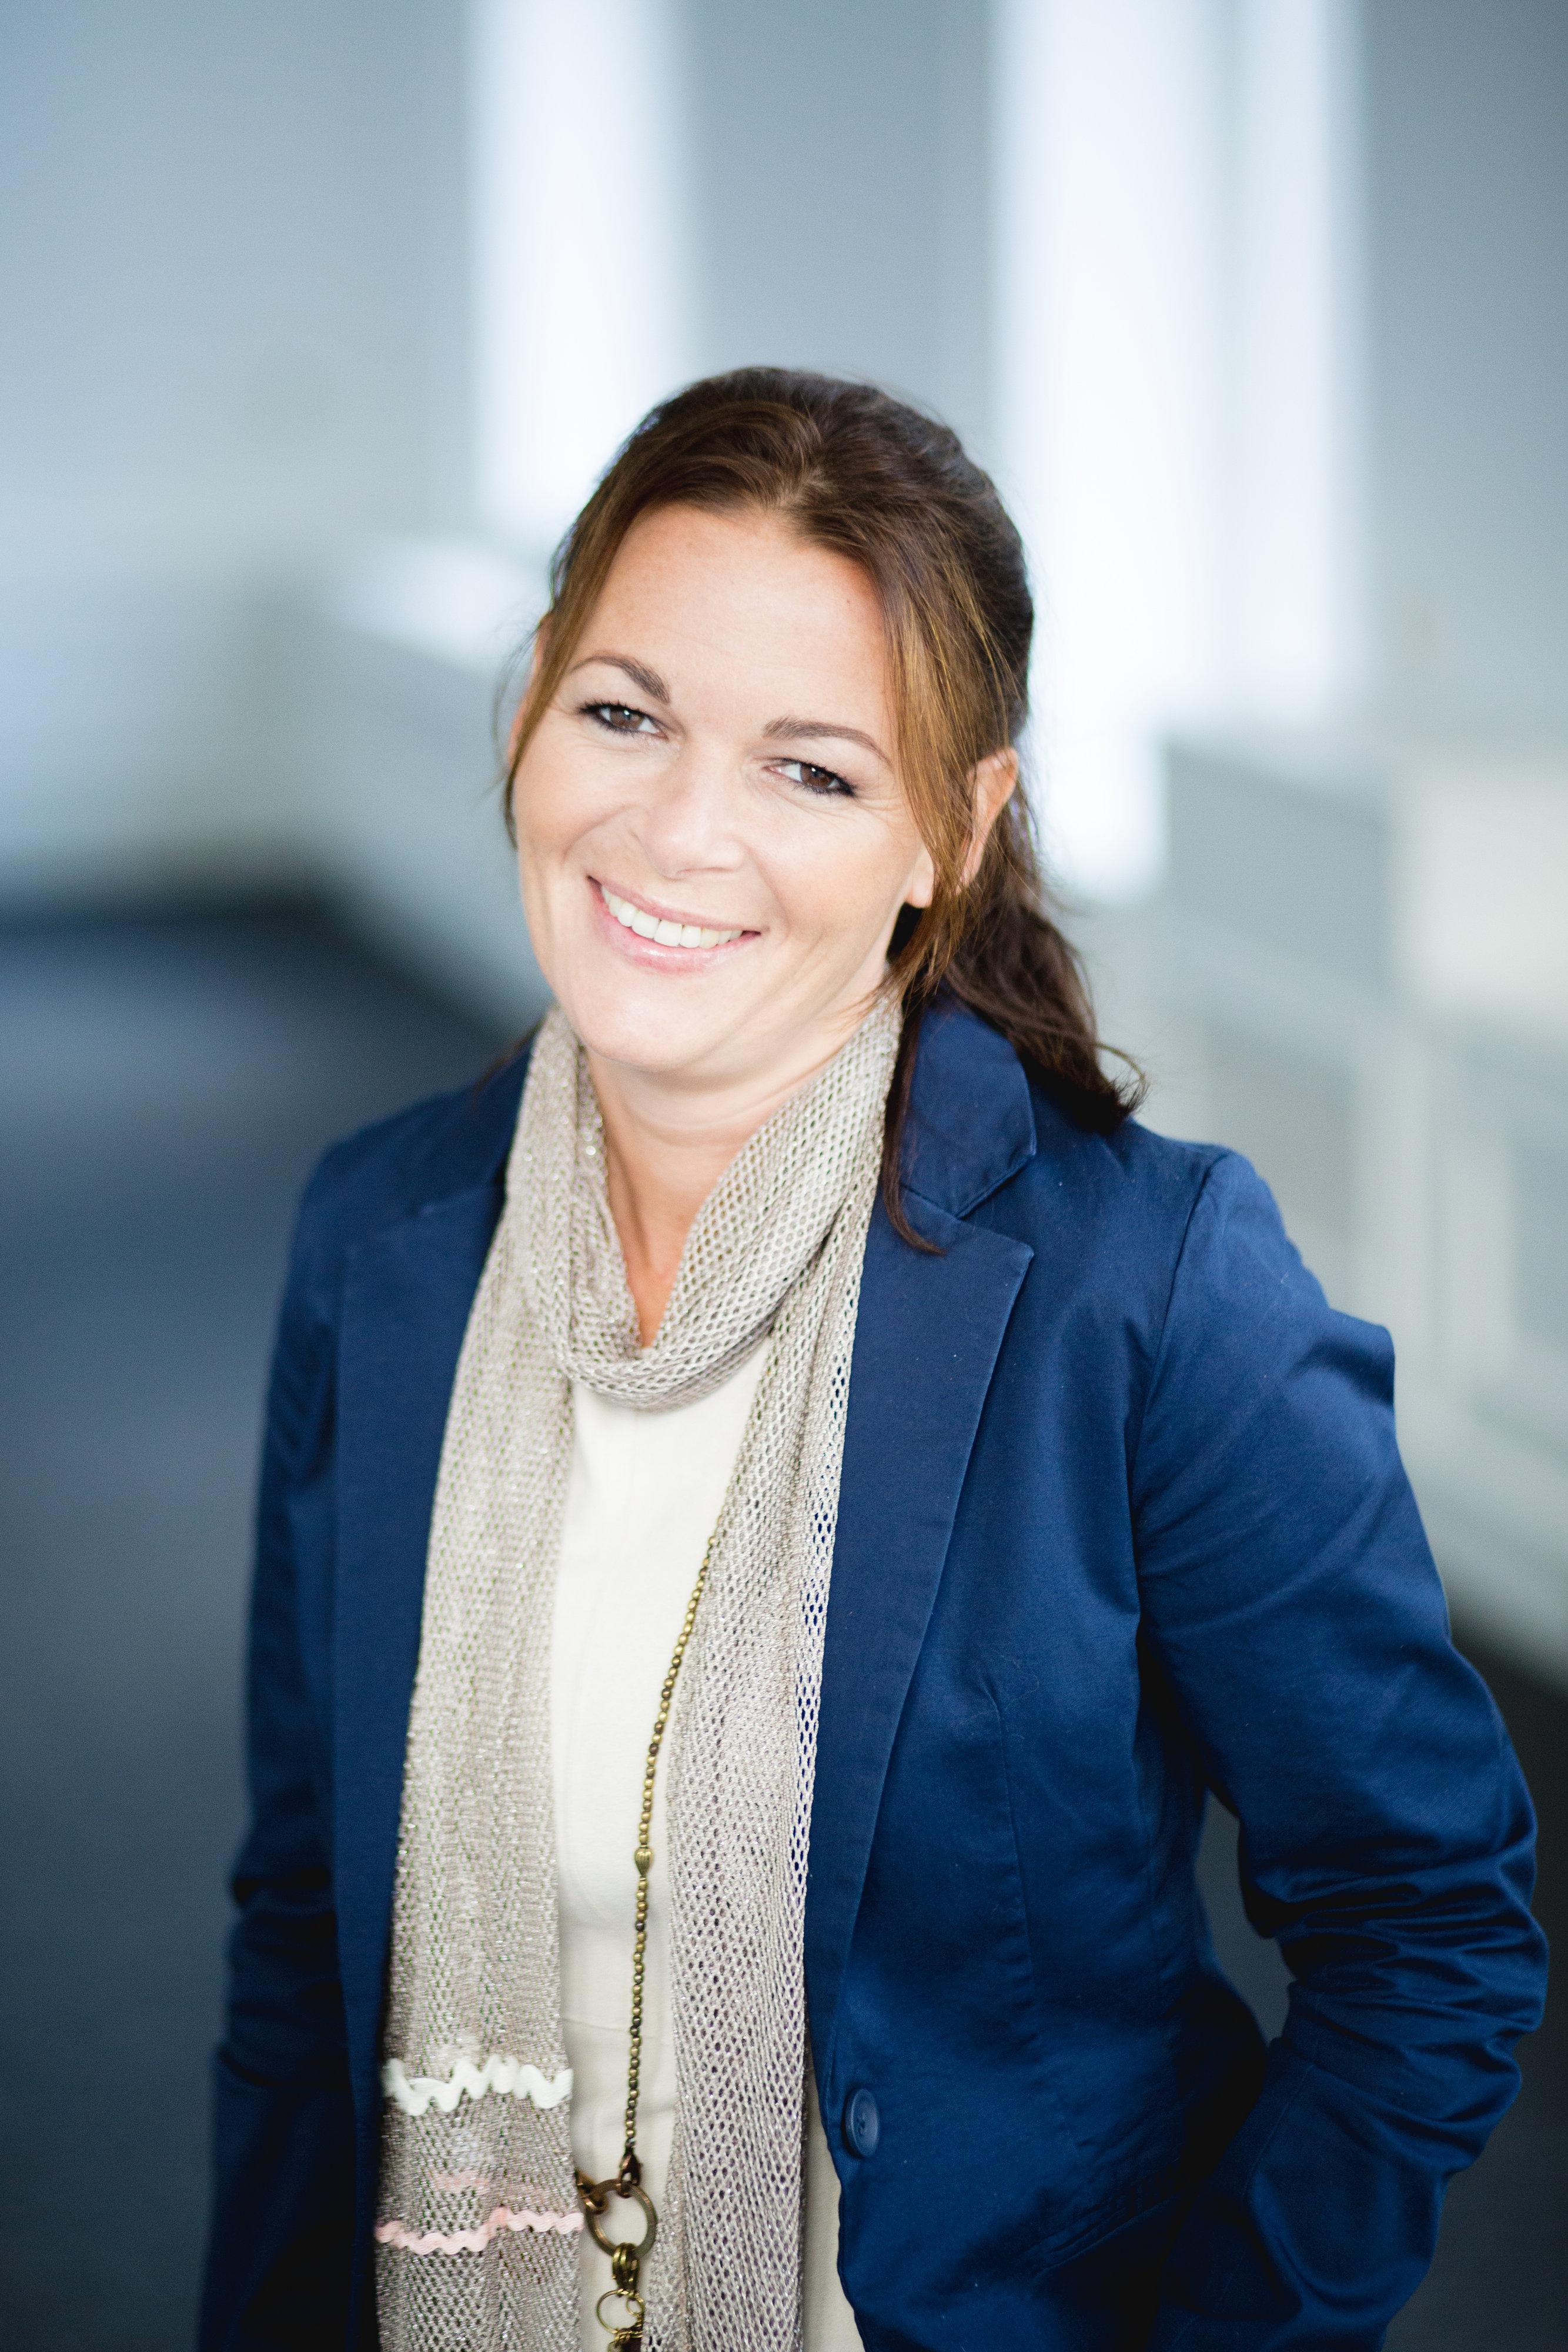 Manon Huijbregts